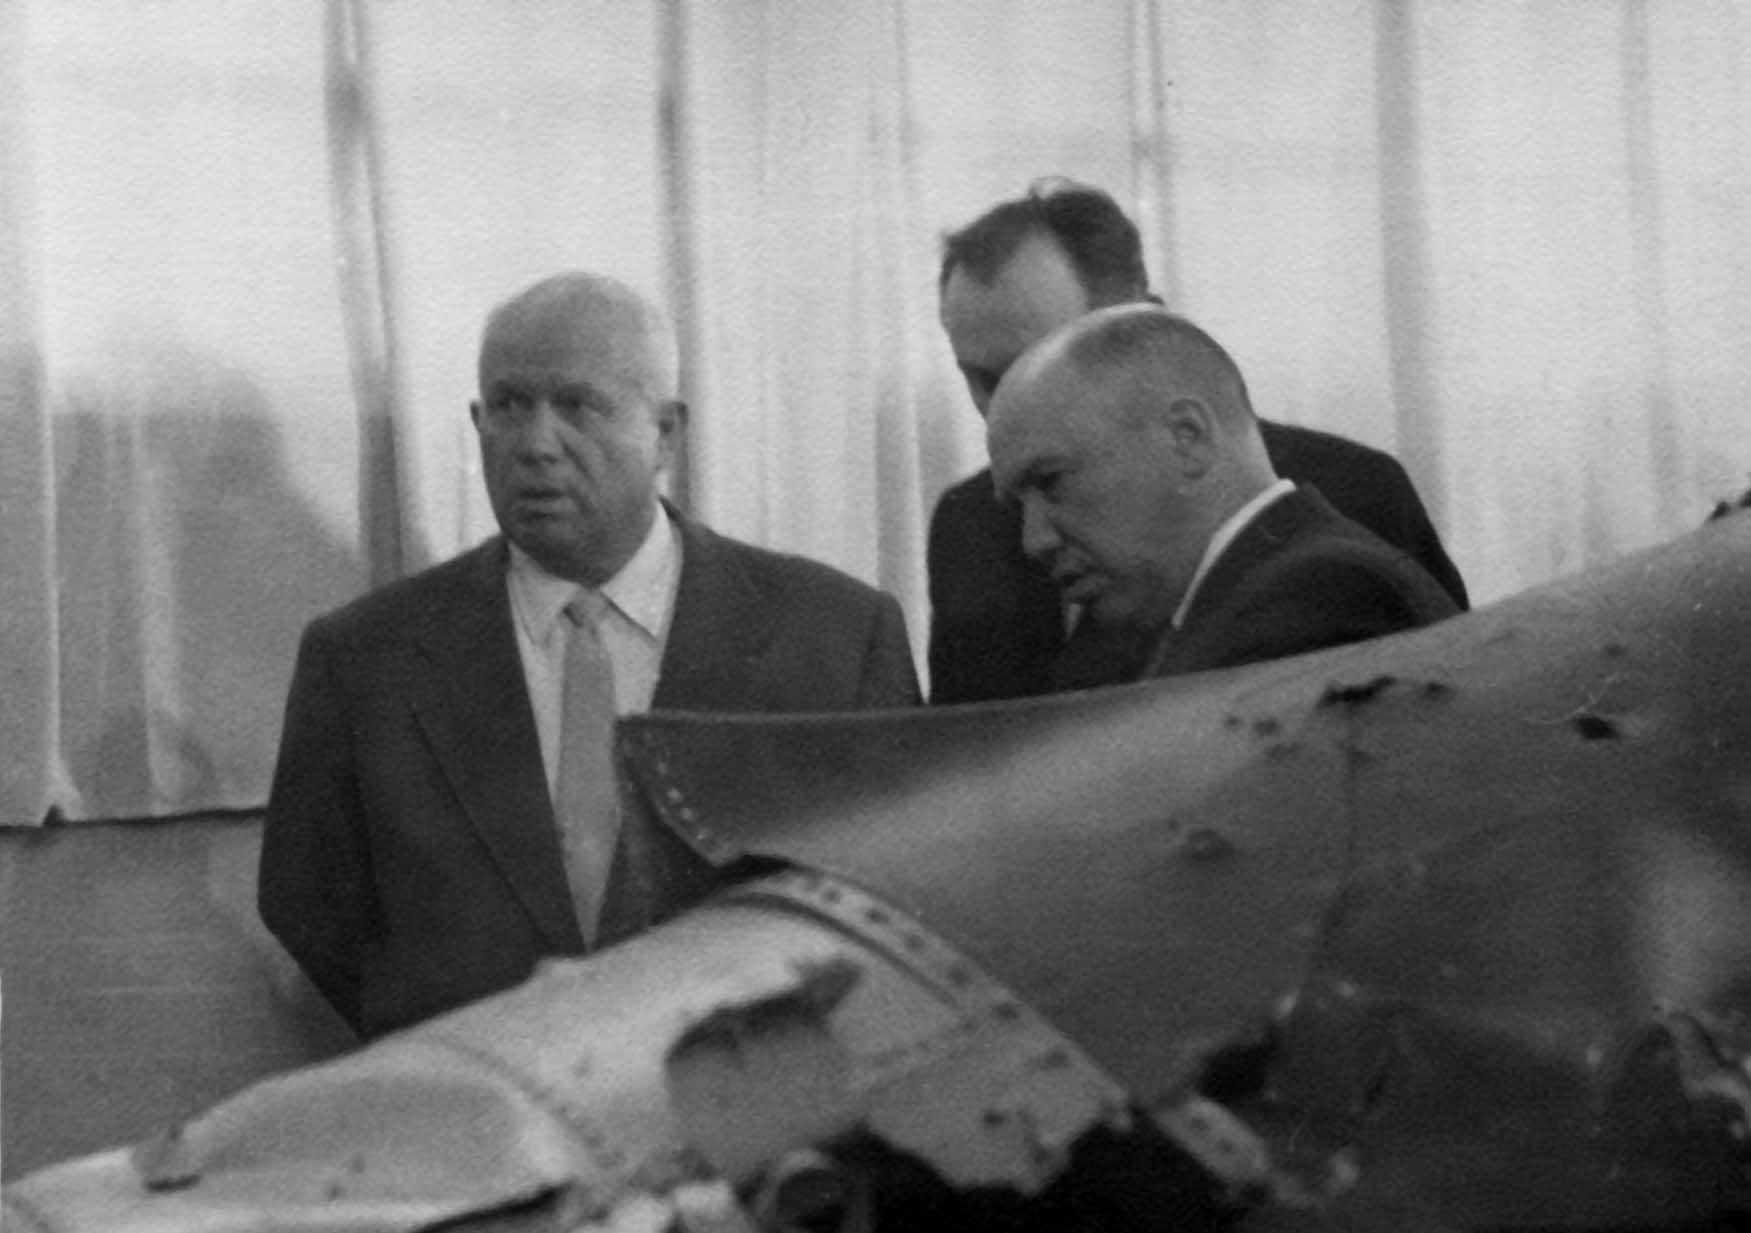 "Экспонат #44. Никита Хрущев у фрагмента американского самолета-шпиона ""Локхид U-2"". Май 1960 года"